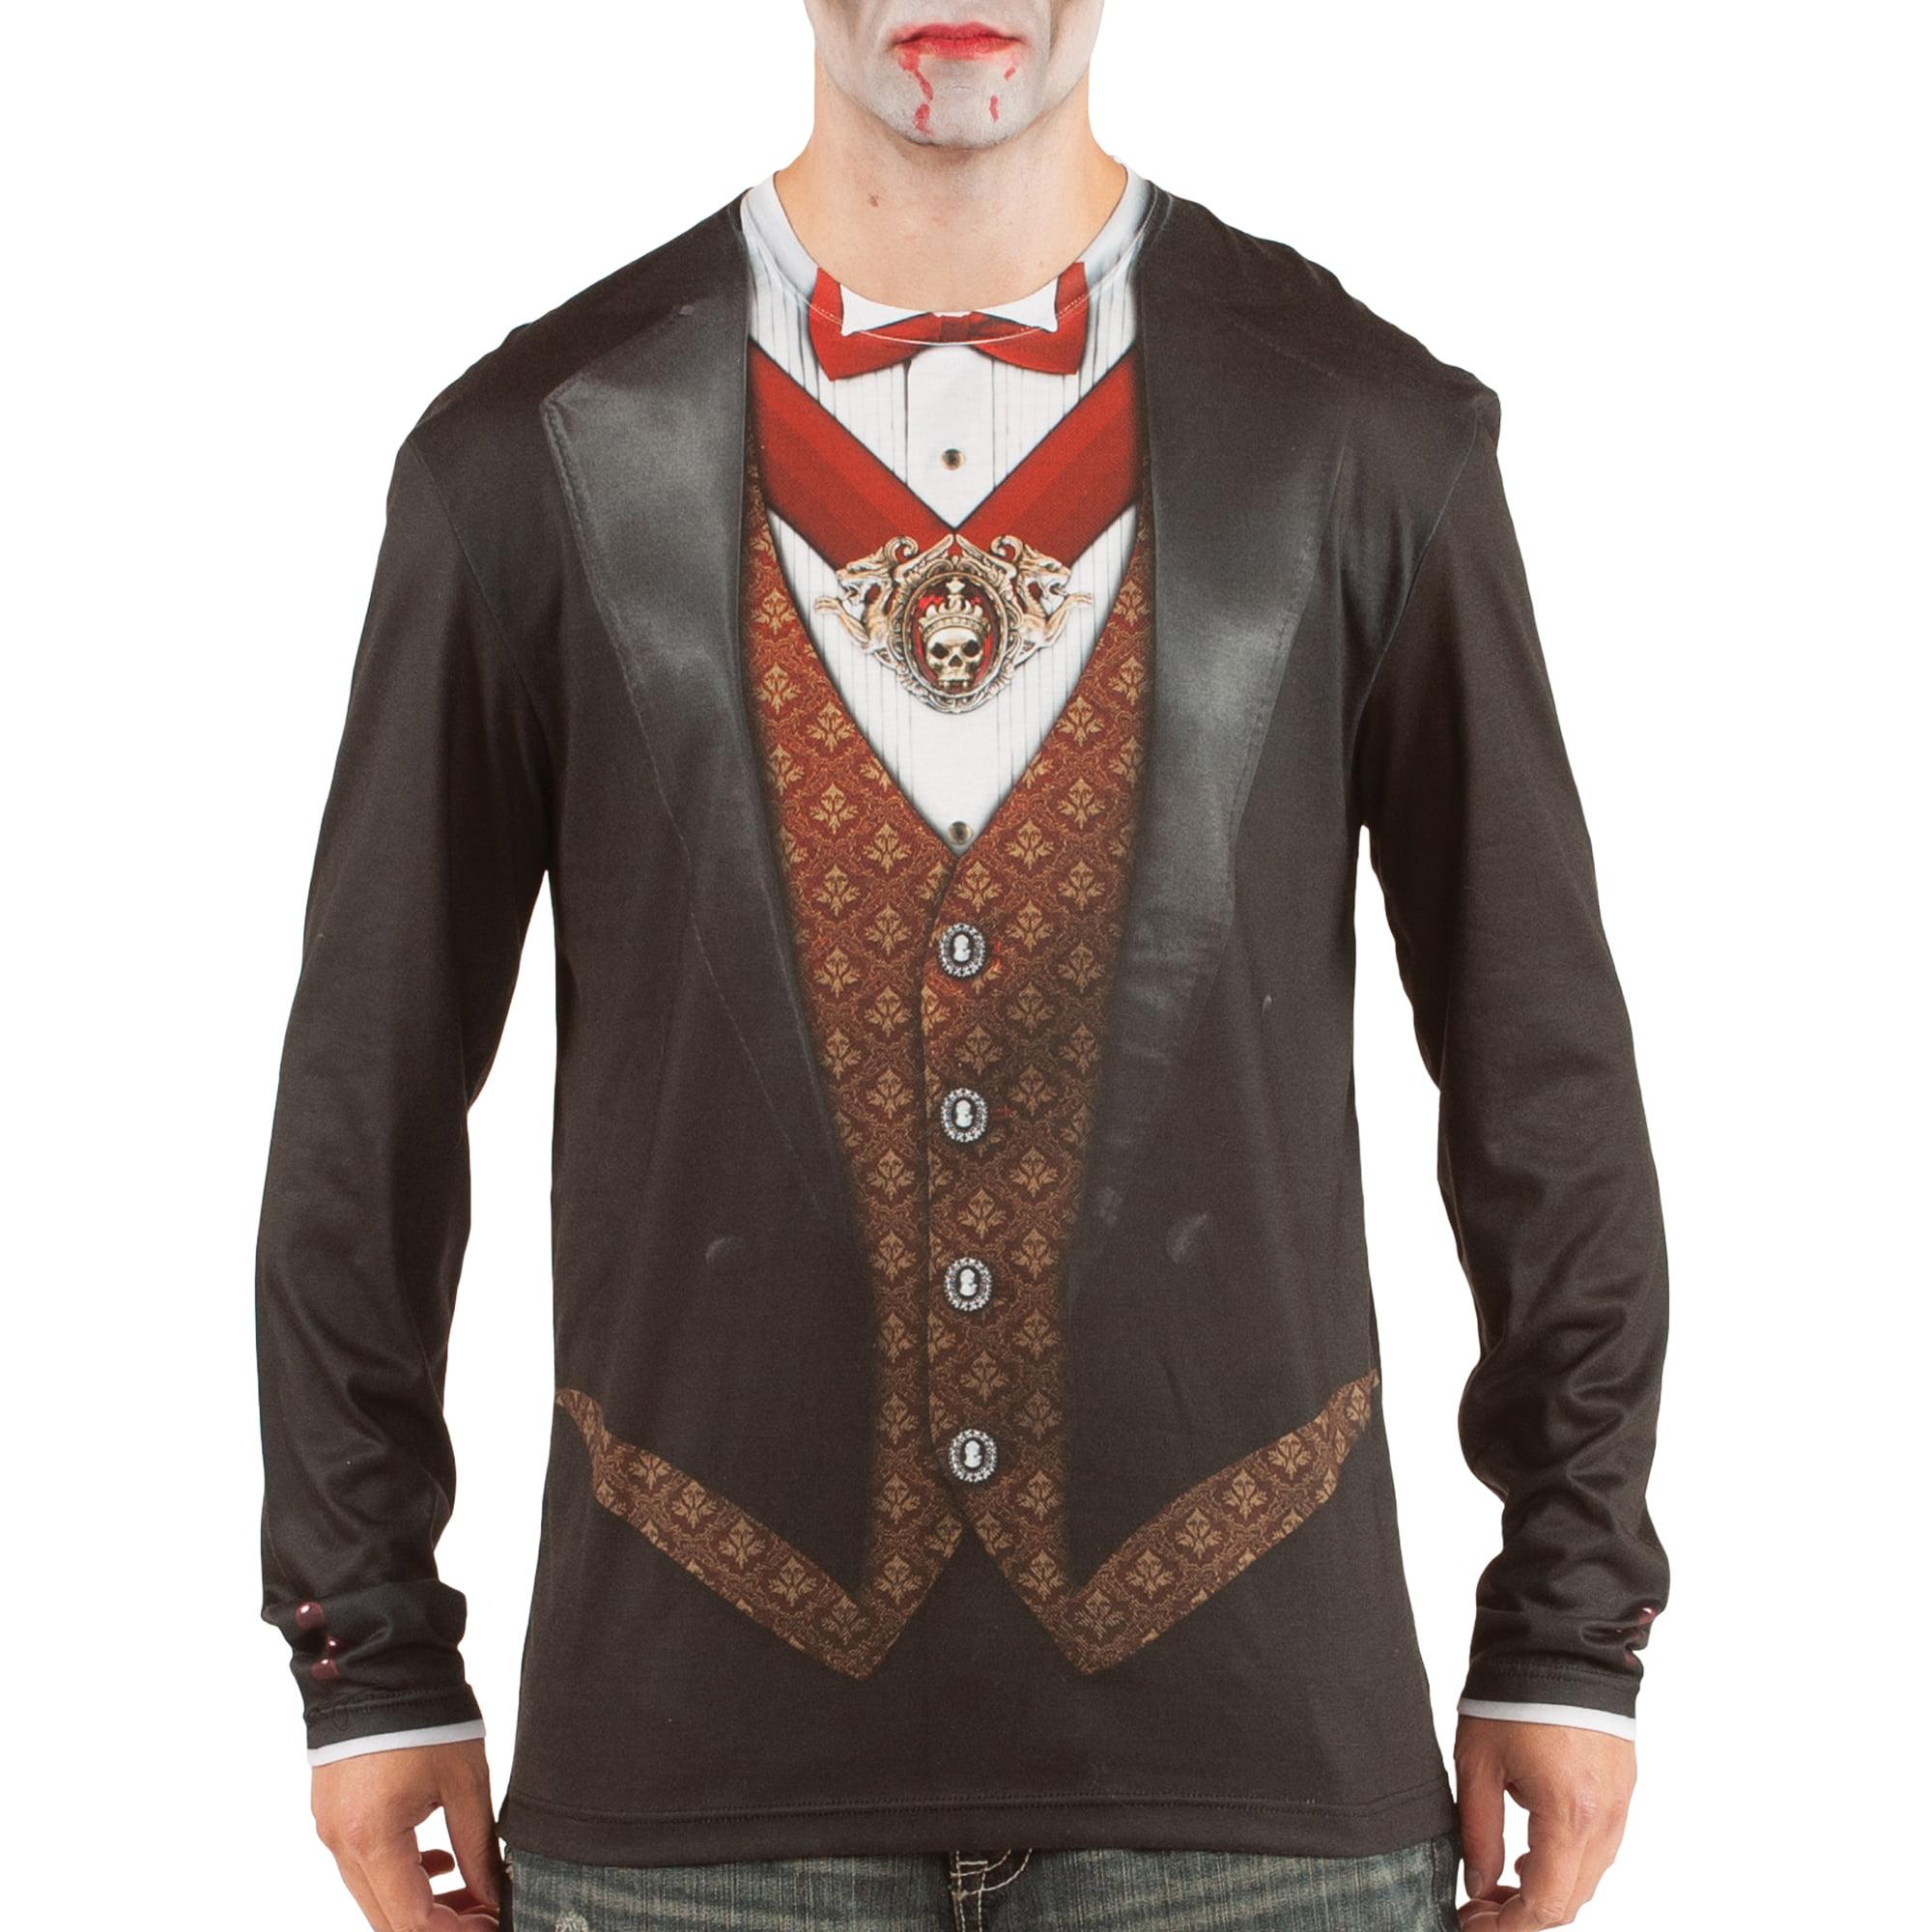 Vampire Men's Long Sleeve Tee Shirt